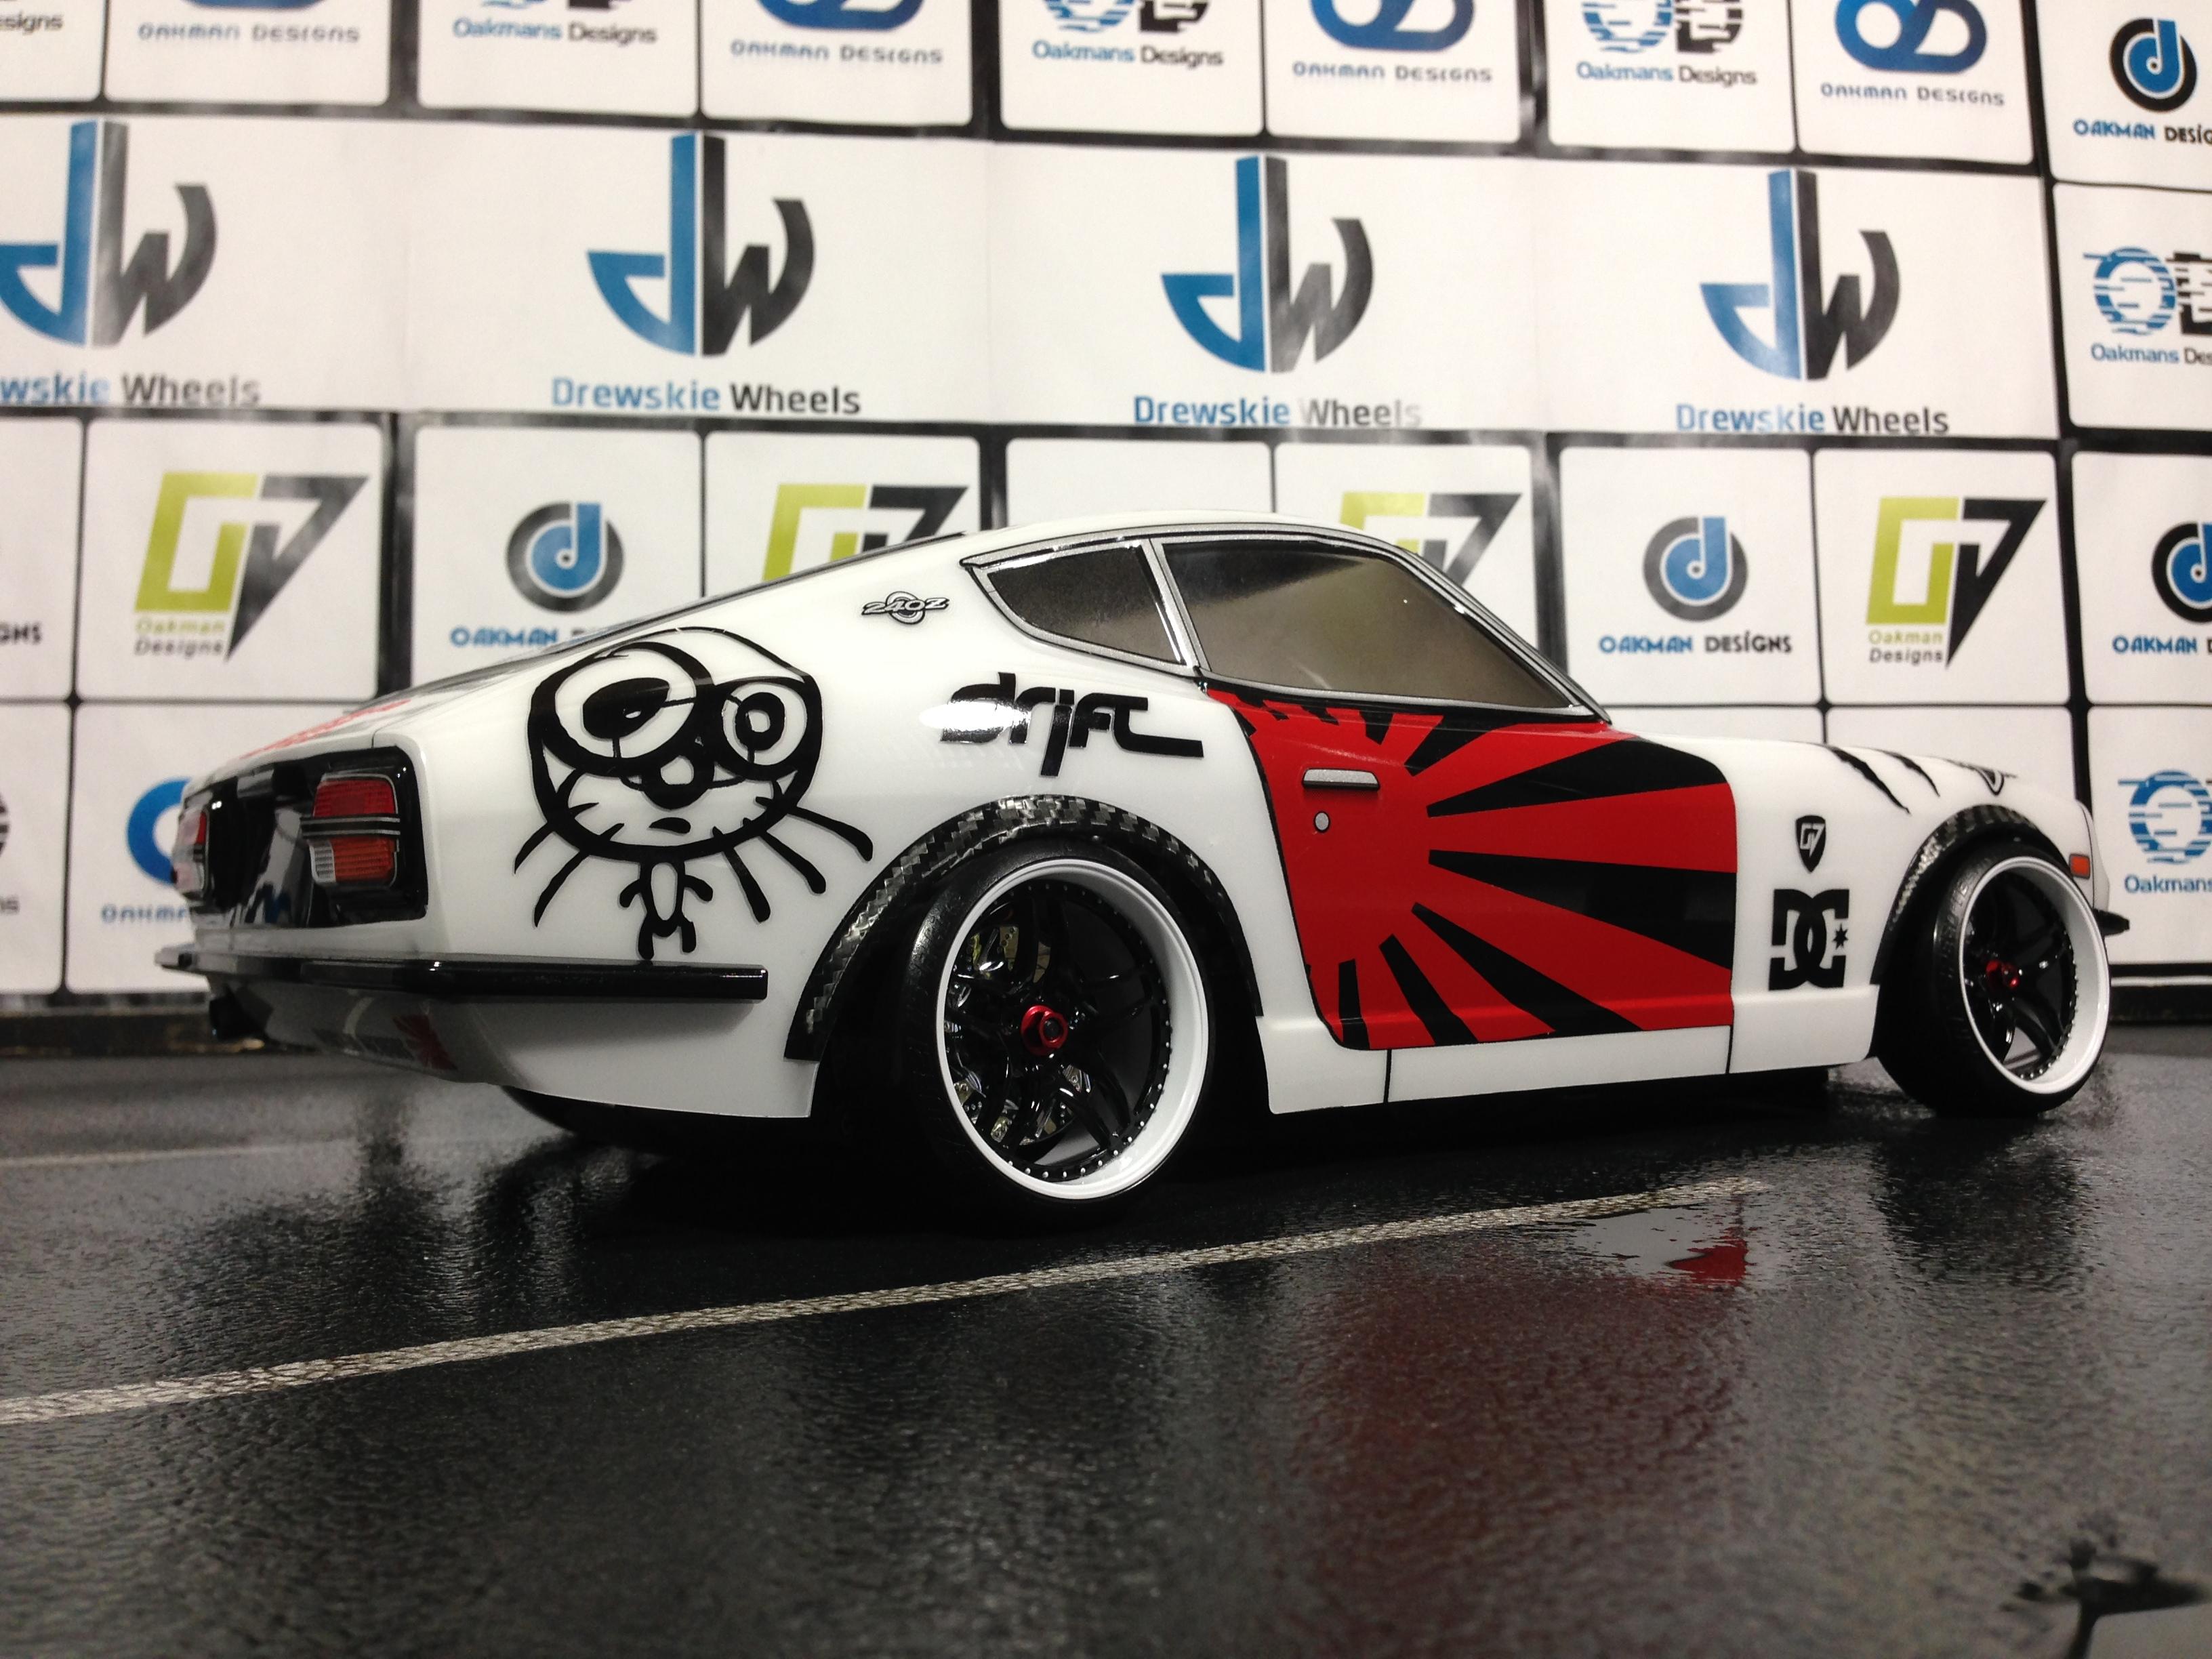 Custom Tamiya 190mm Datsun 240z R/C Drift Car | Oak-man ...